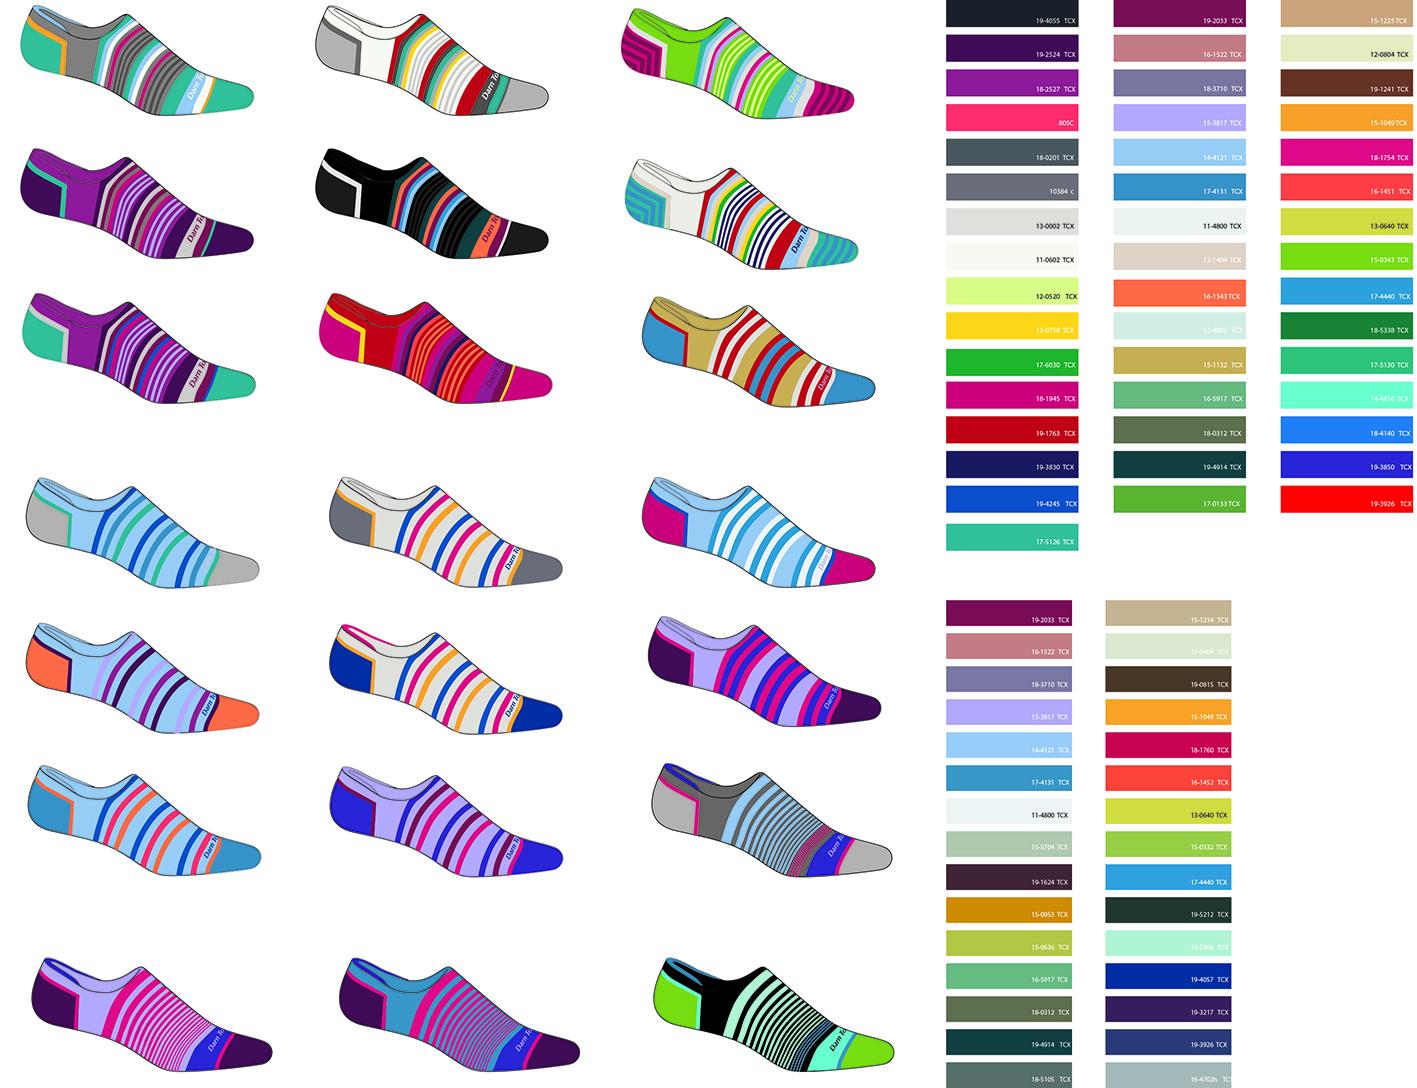 Darn Tough No-Show Socks